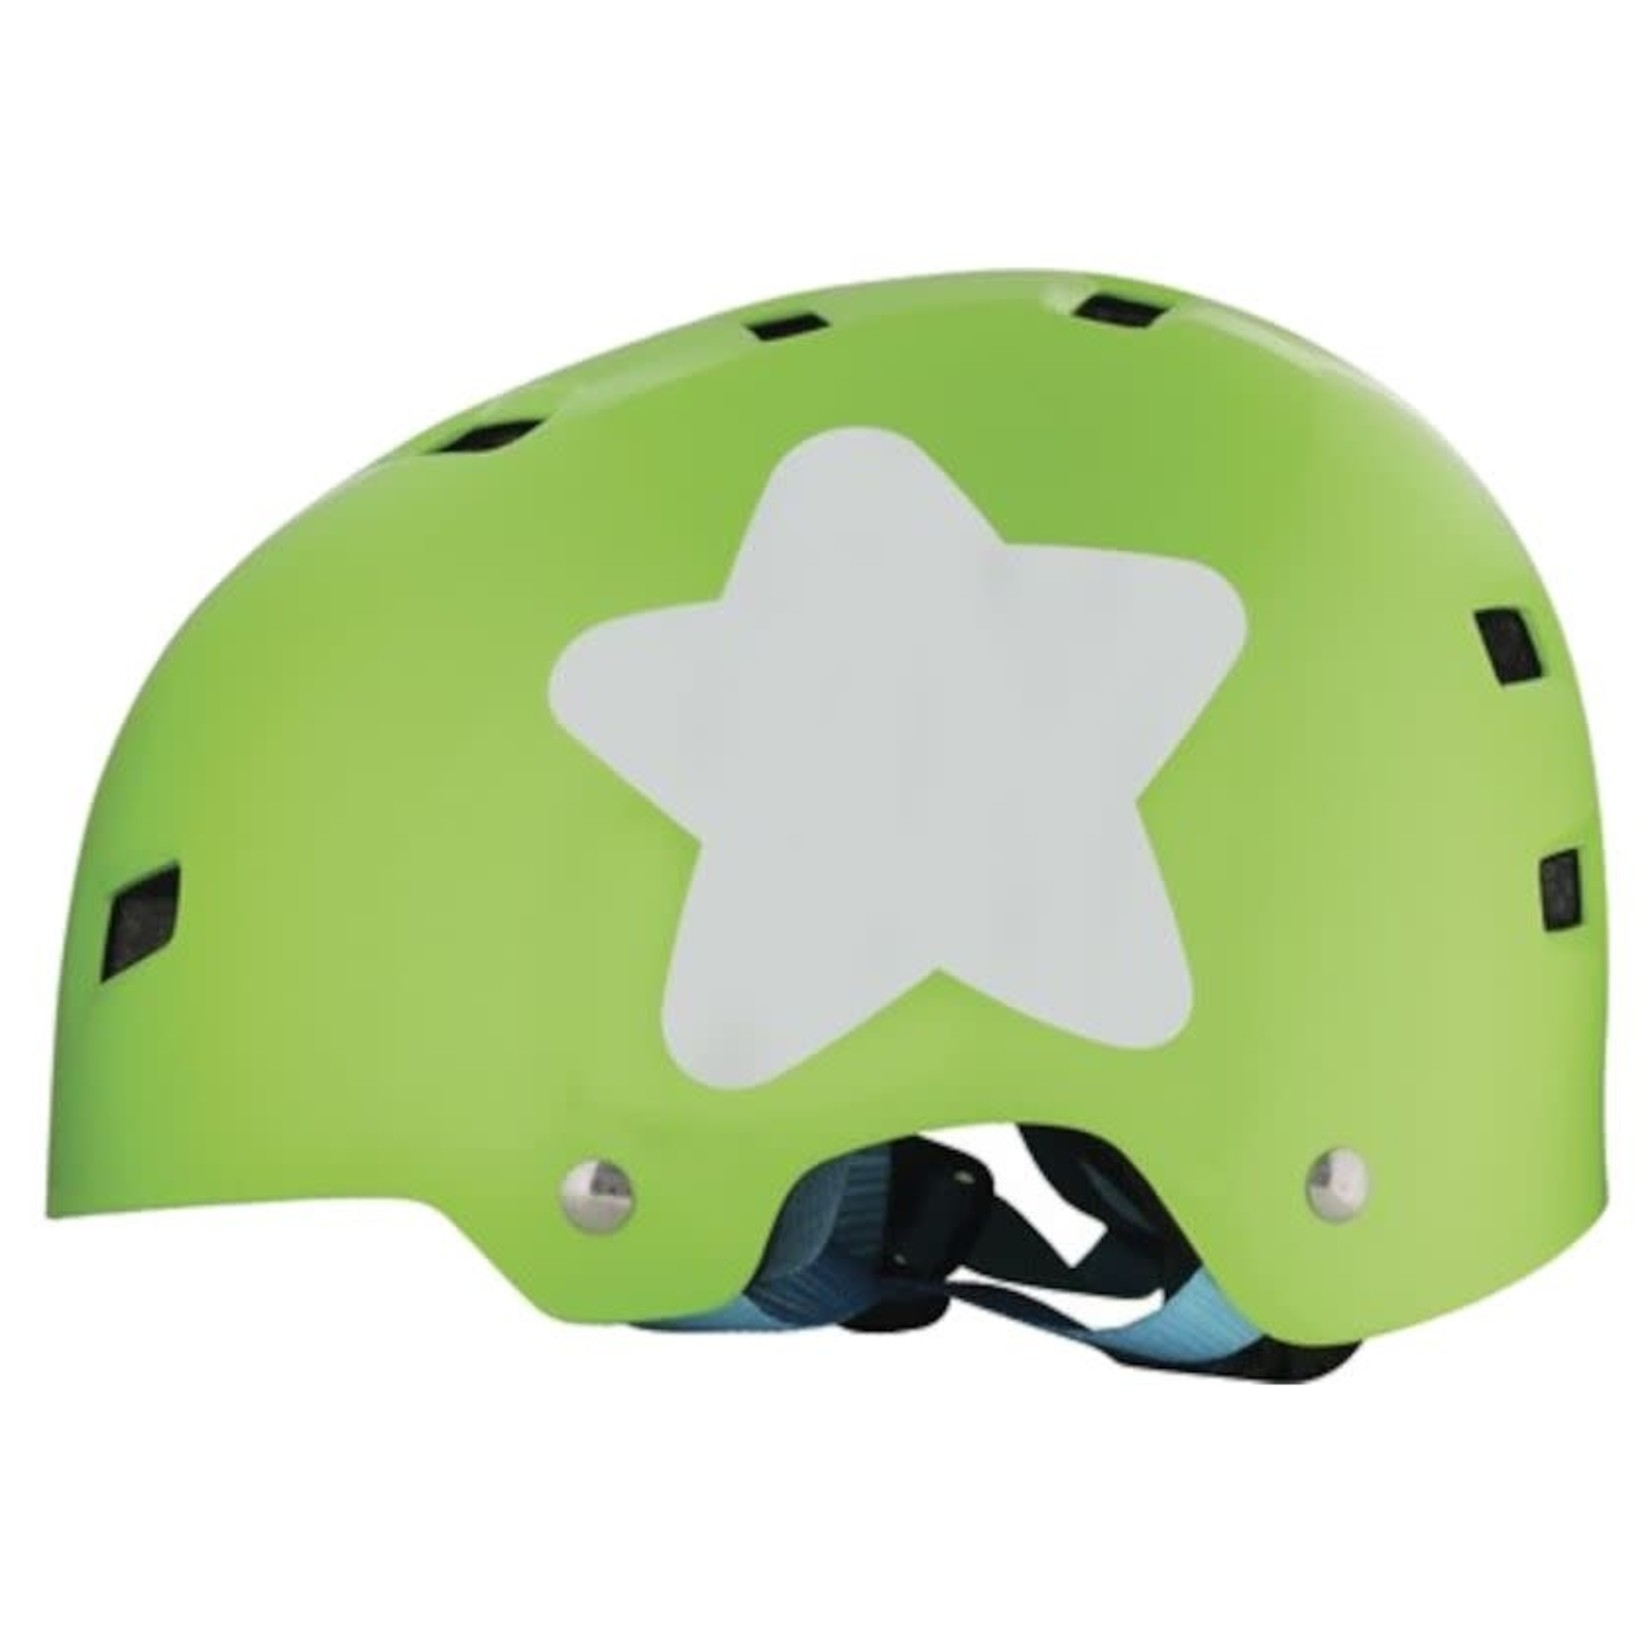 Azur T35 Kids 50-54cm Bluey Helmet